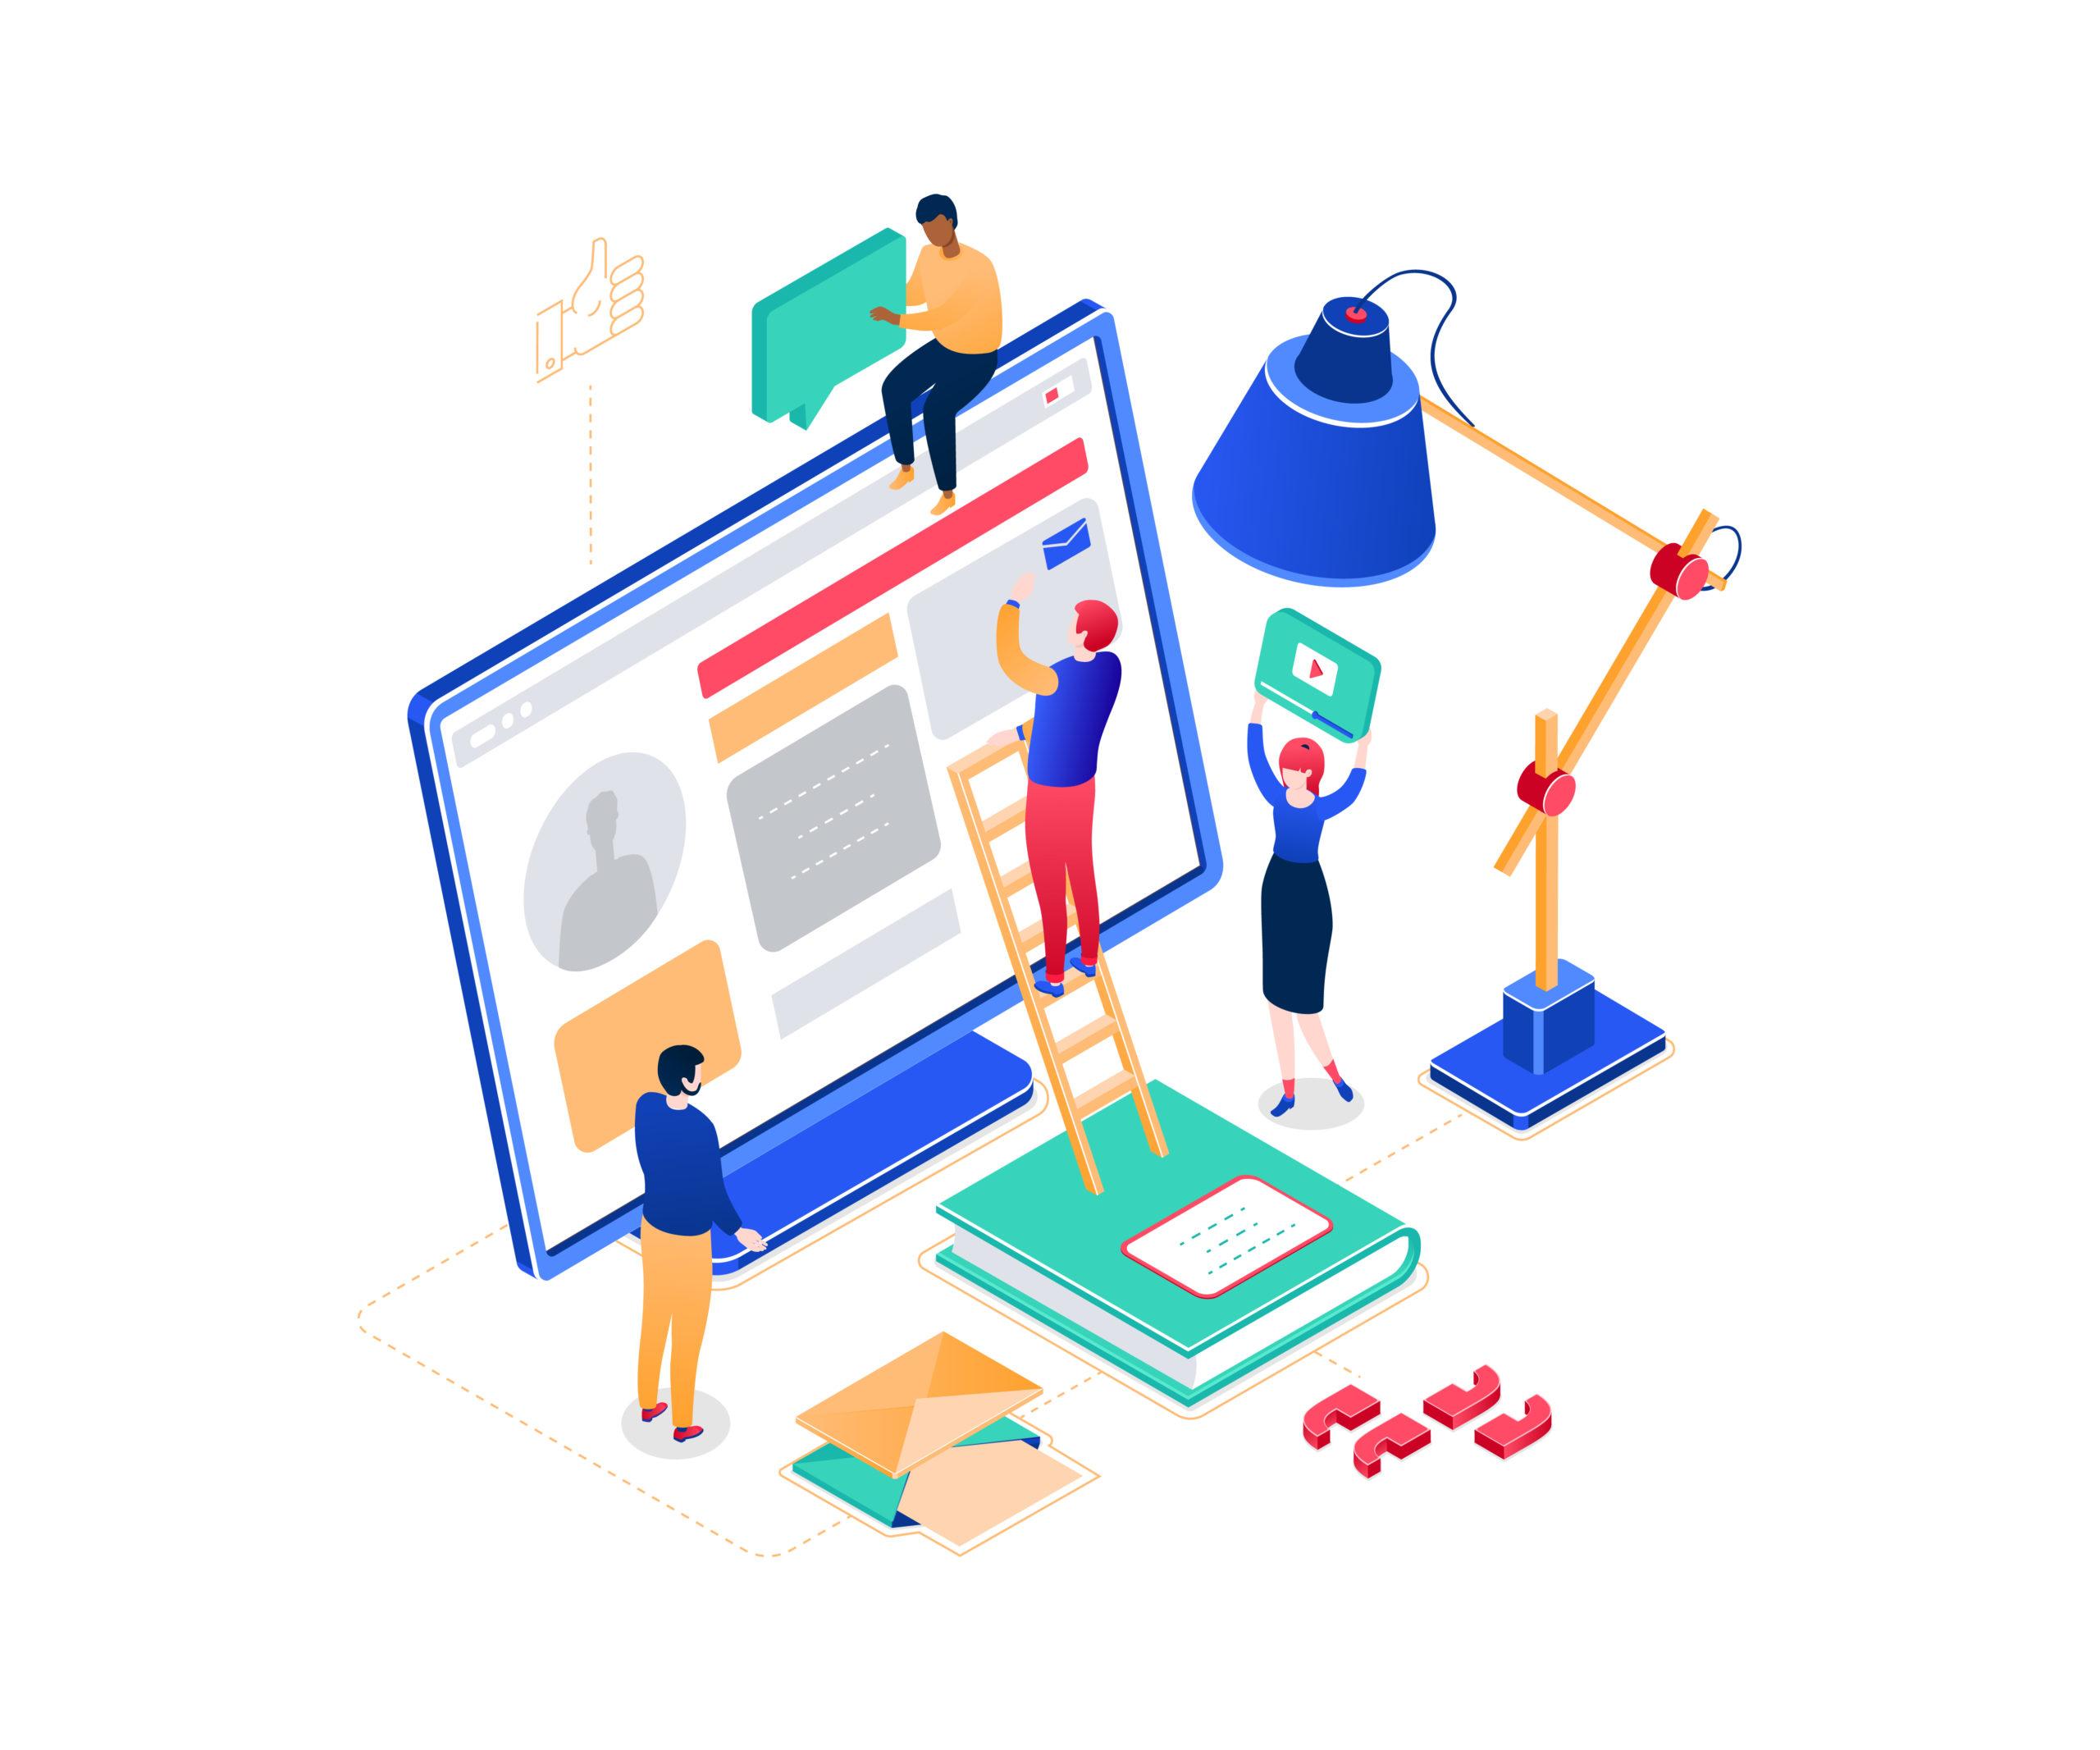 MarketingGuru's Guide to Social Media Marketing